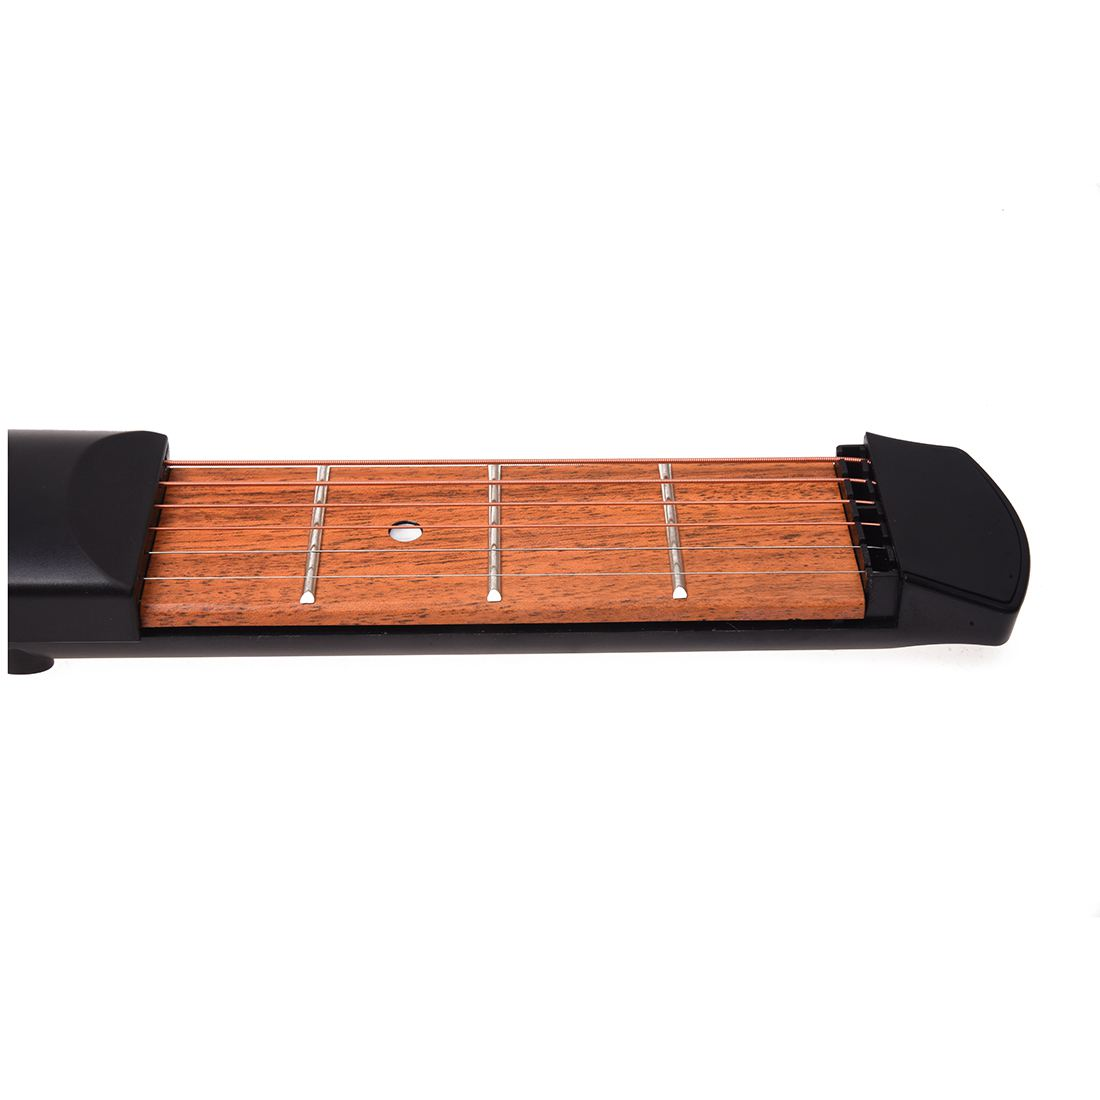 Quality Pocket Strings Guitar Practice Tool Gadget Novice Expert 4 Fret Model Portable Black